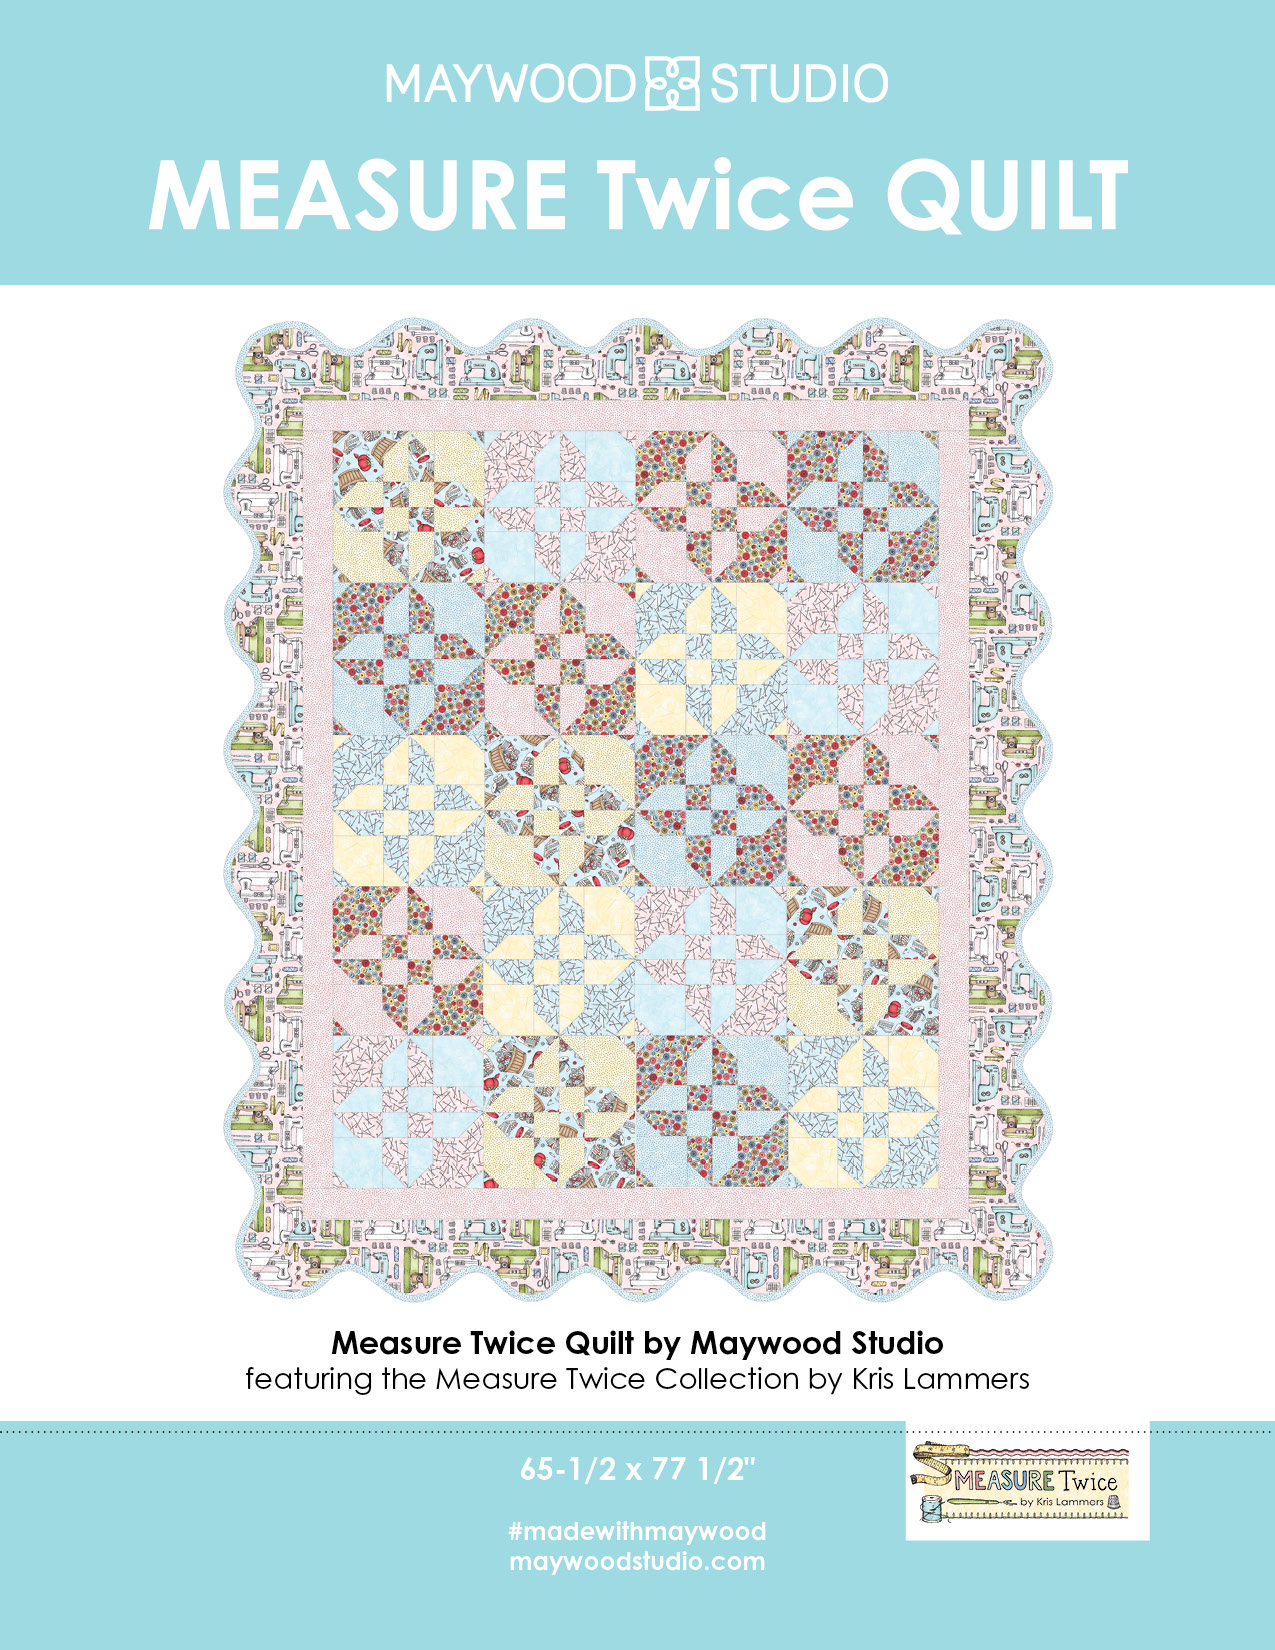 Measure Twice Quilt